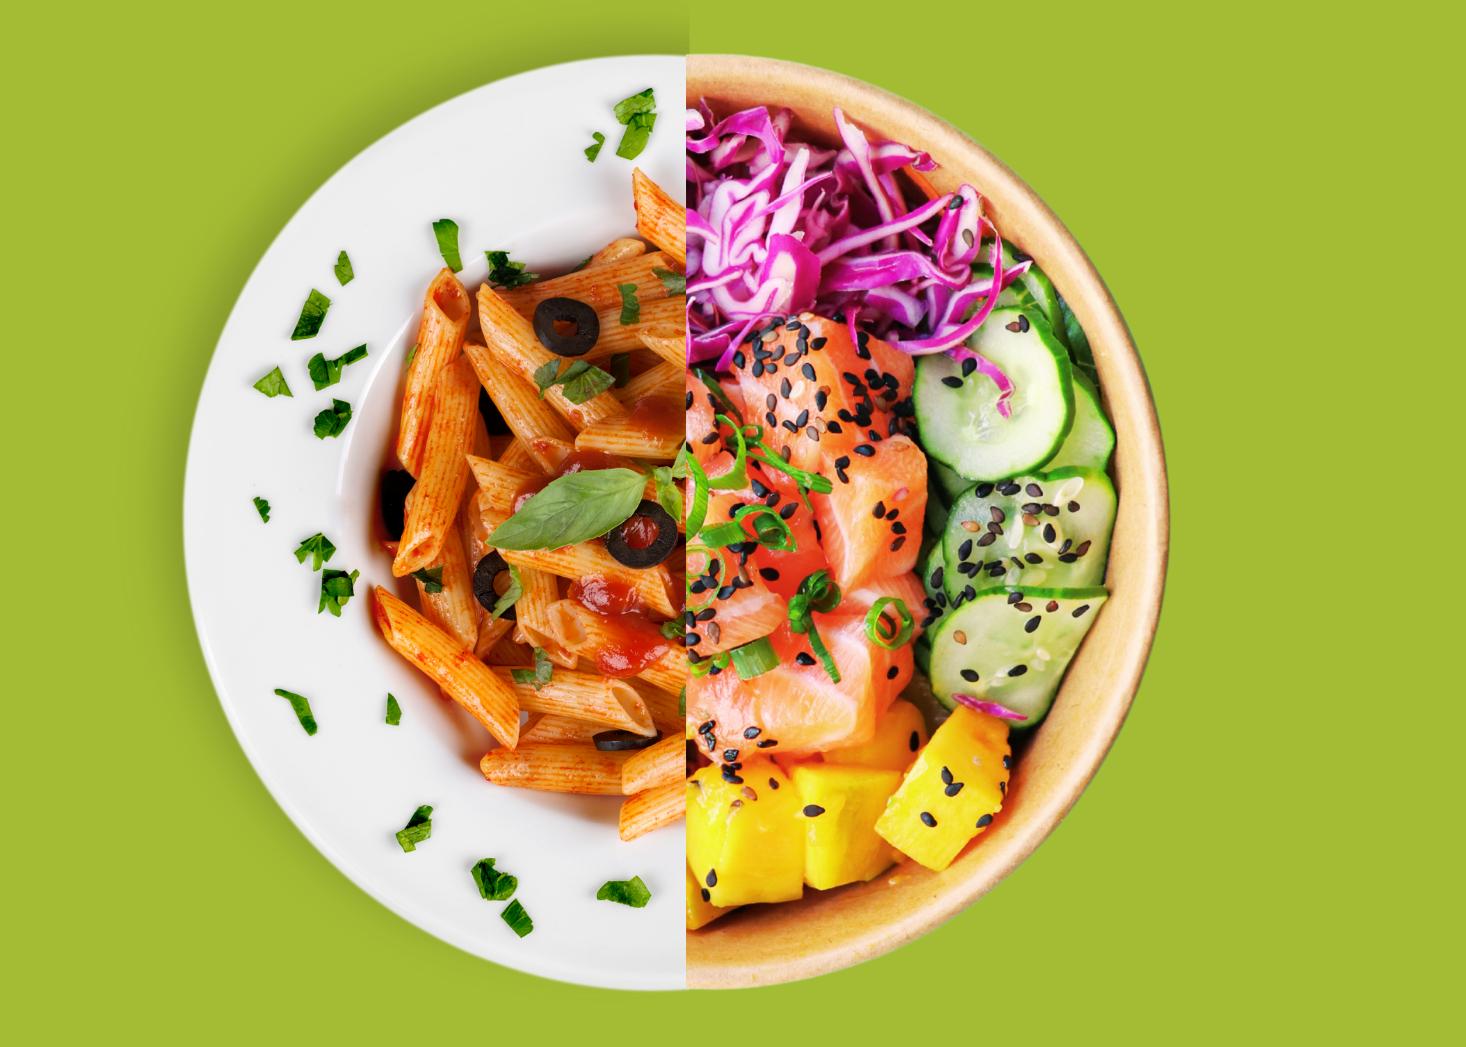 healthy food - food boxing - Ghost Kitchen Italia